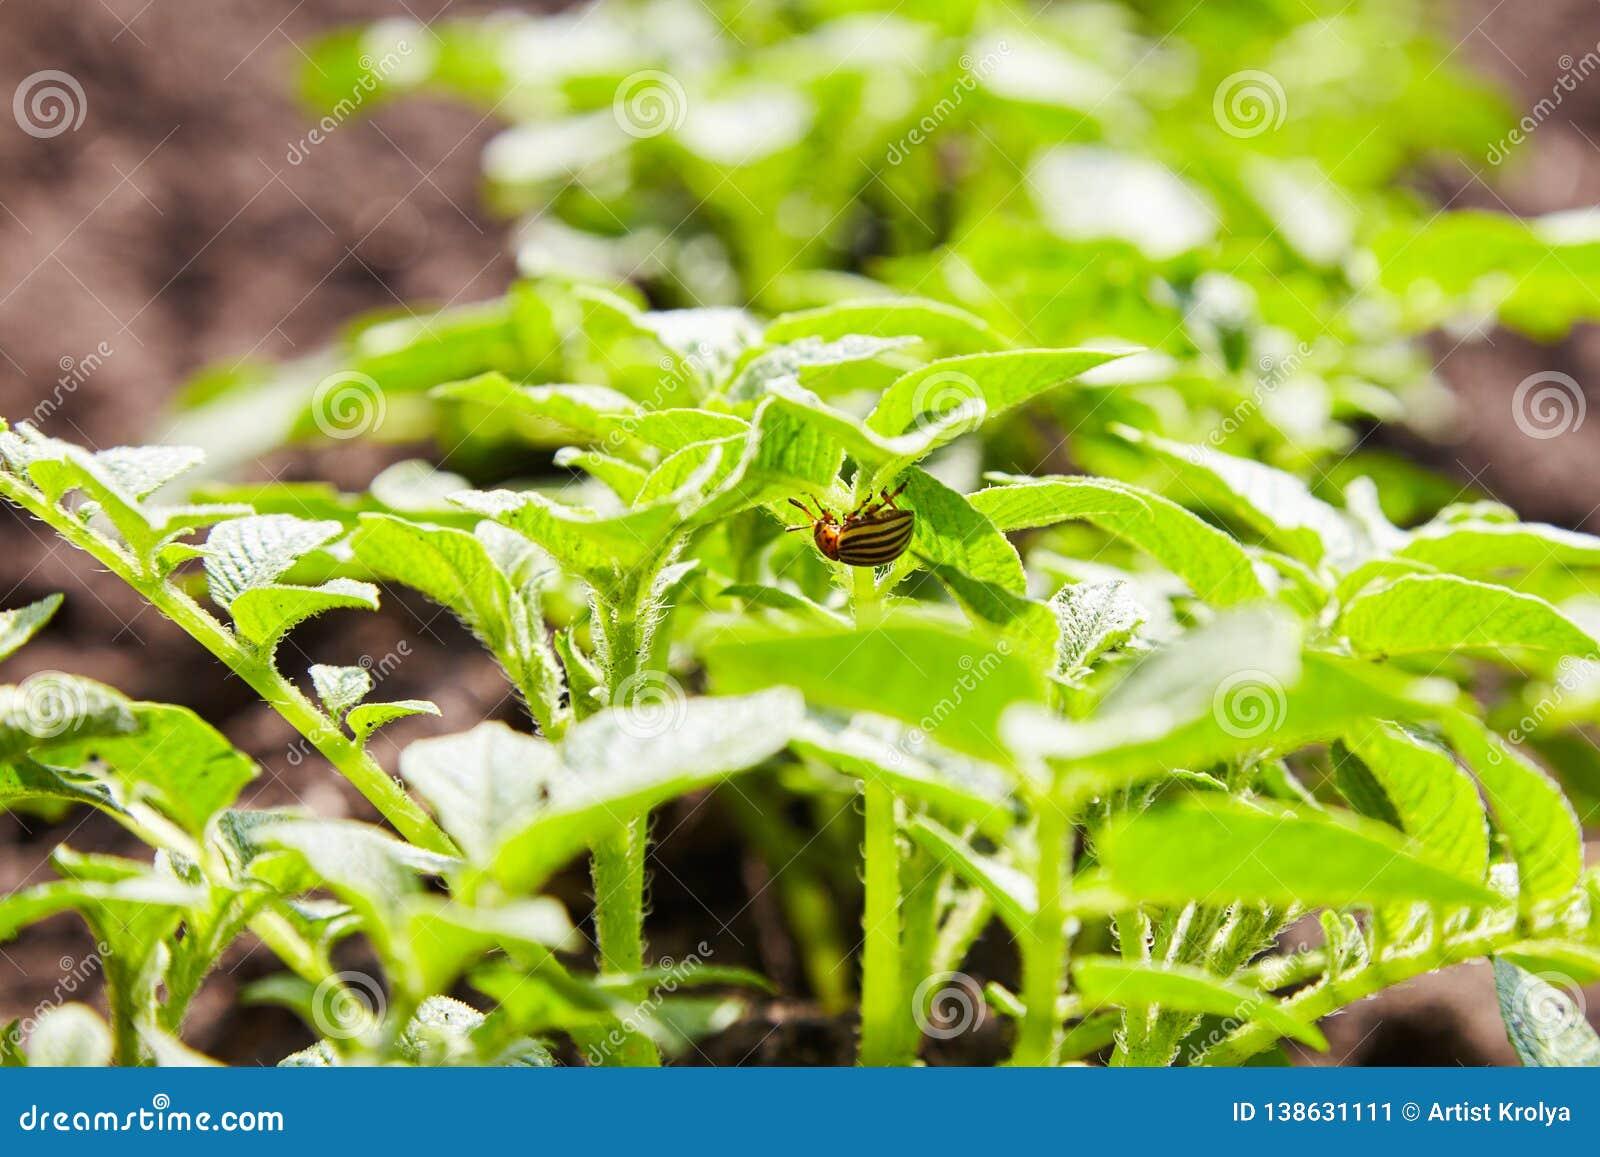 Colorado beetle hiding under the potato leaf. The Colorado Potato Striped Beetle